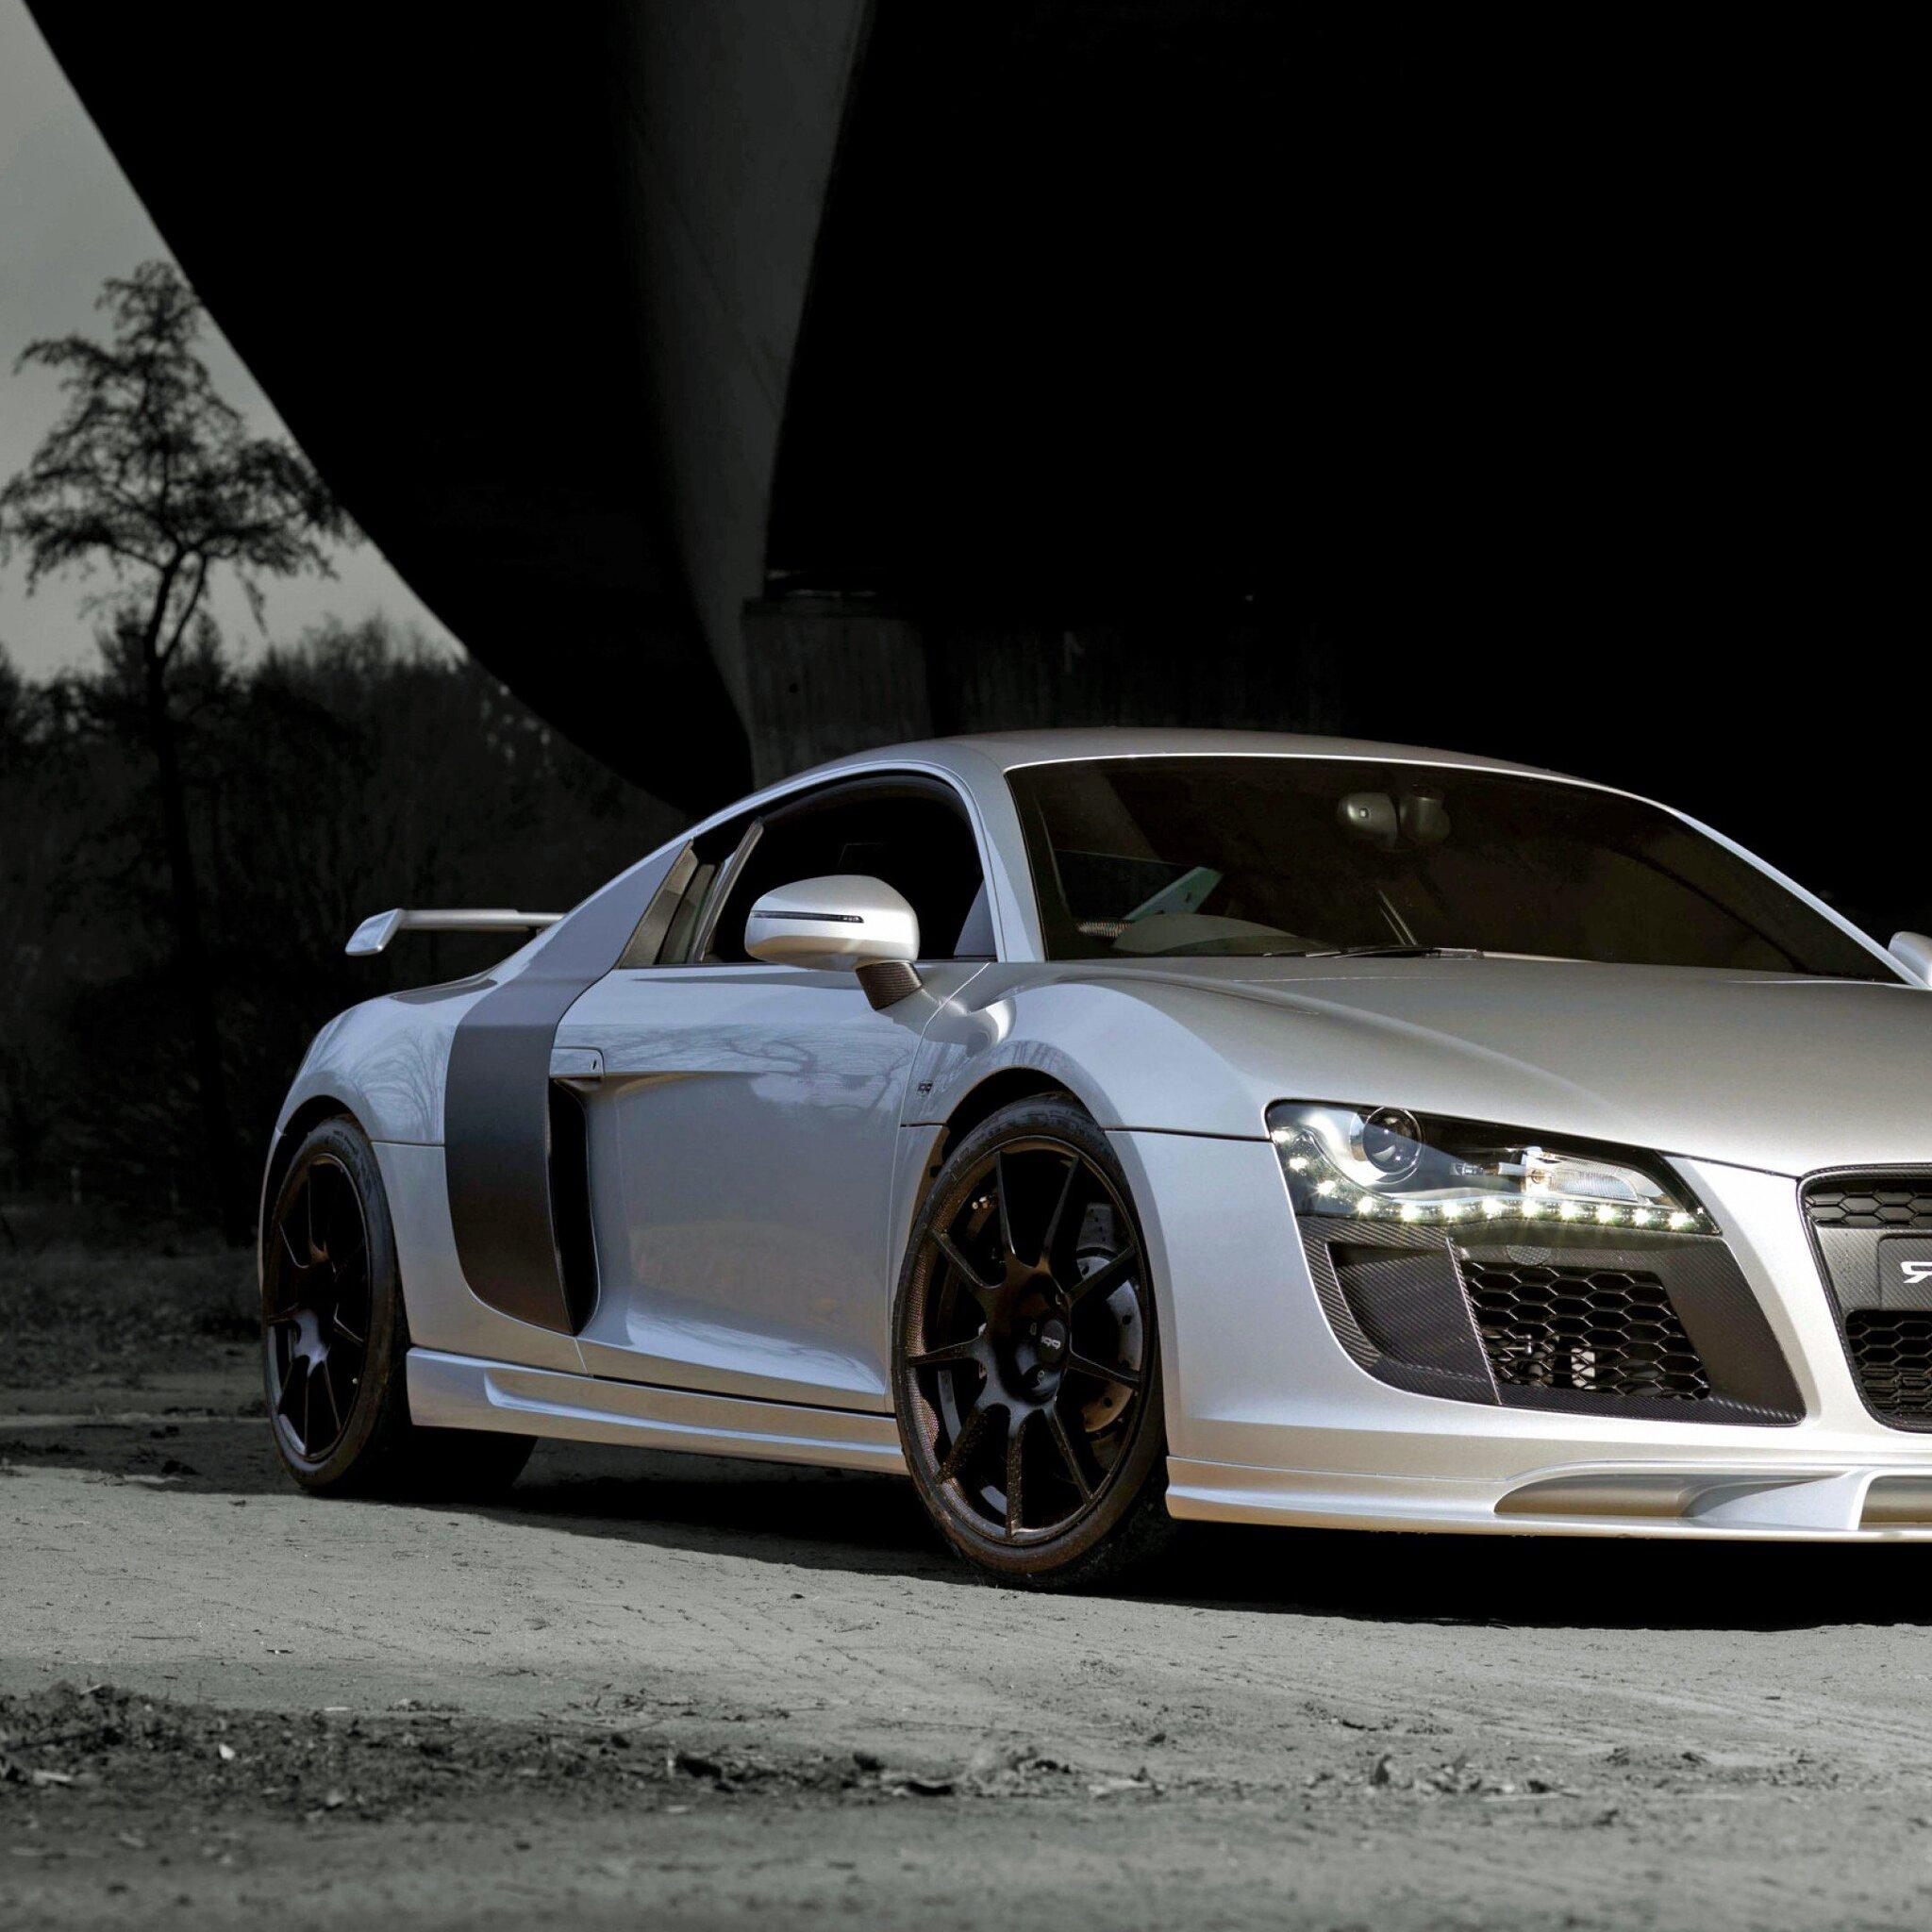 Audi Car Wallpaper: 2048x2048 Audi R8 Silver Ipad Air HD 4k Wallpapers, Images